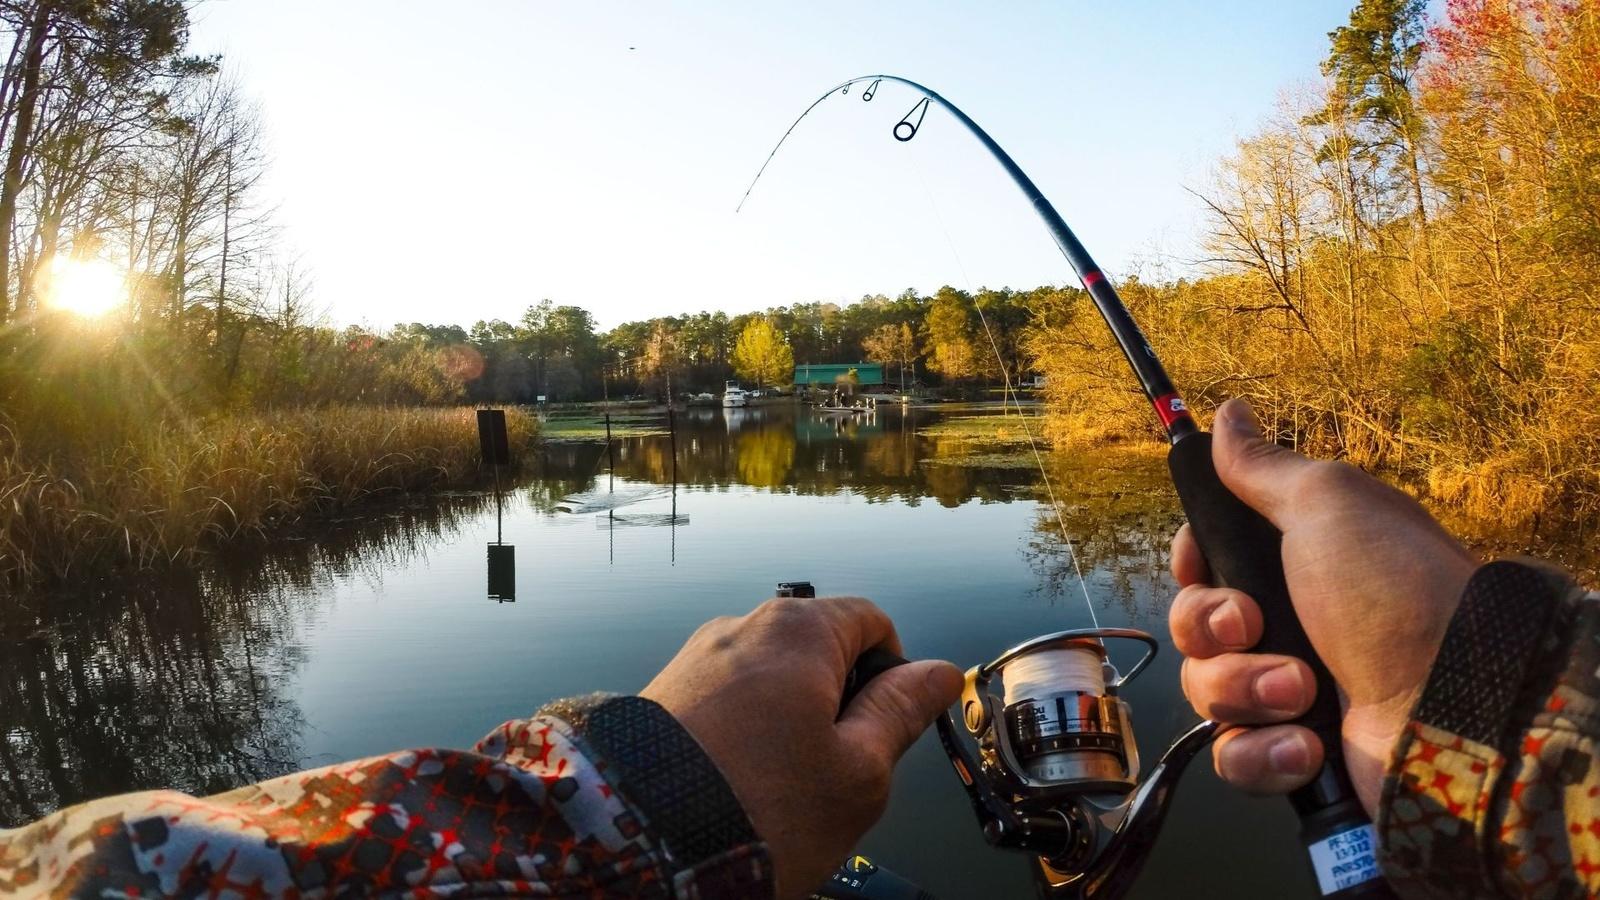 Картинка с рыбалки